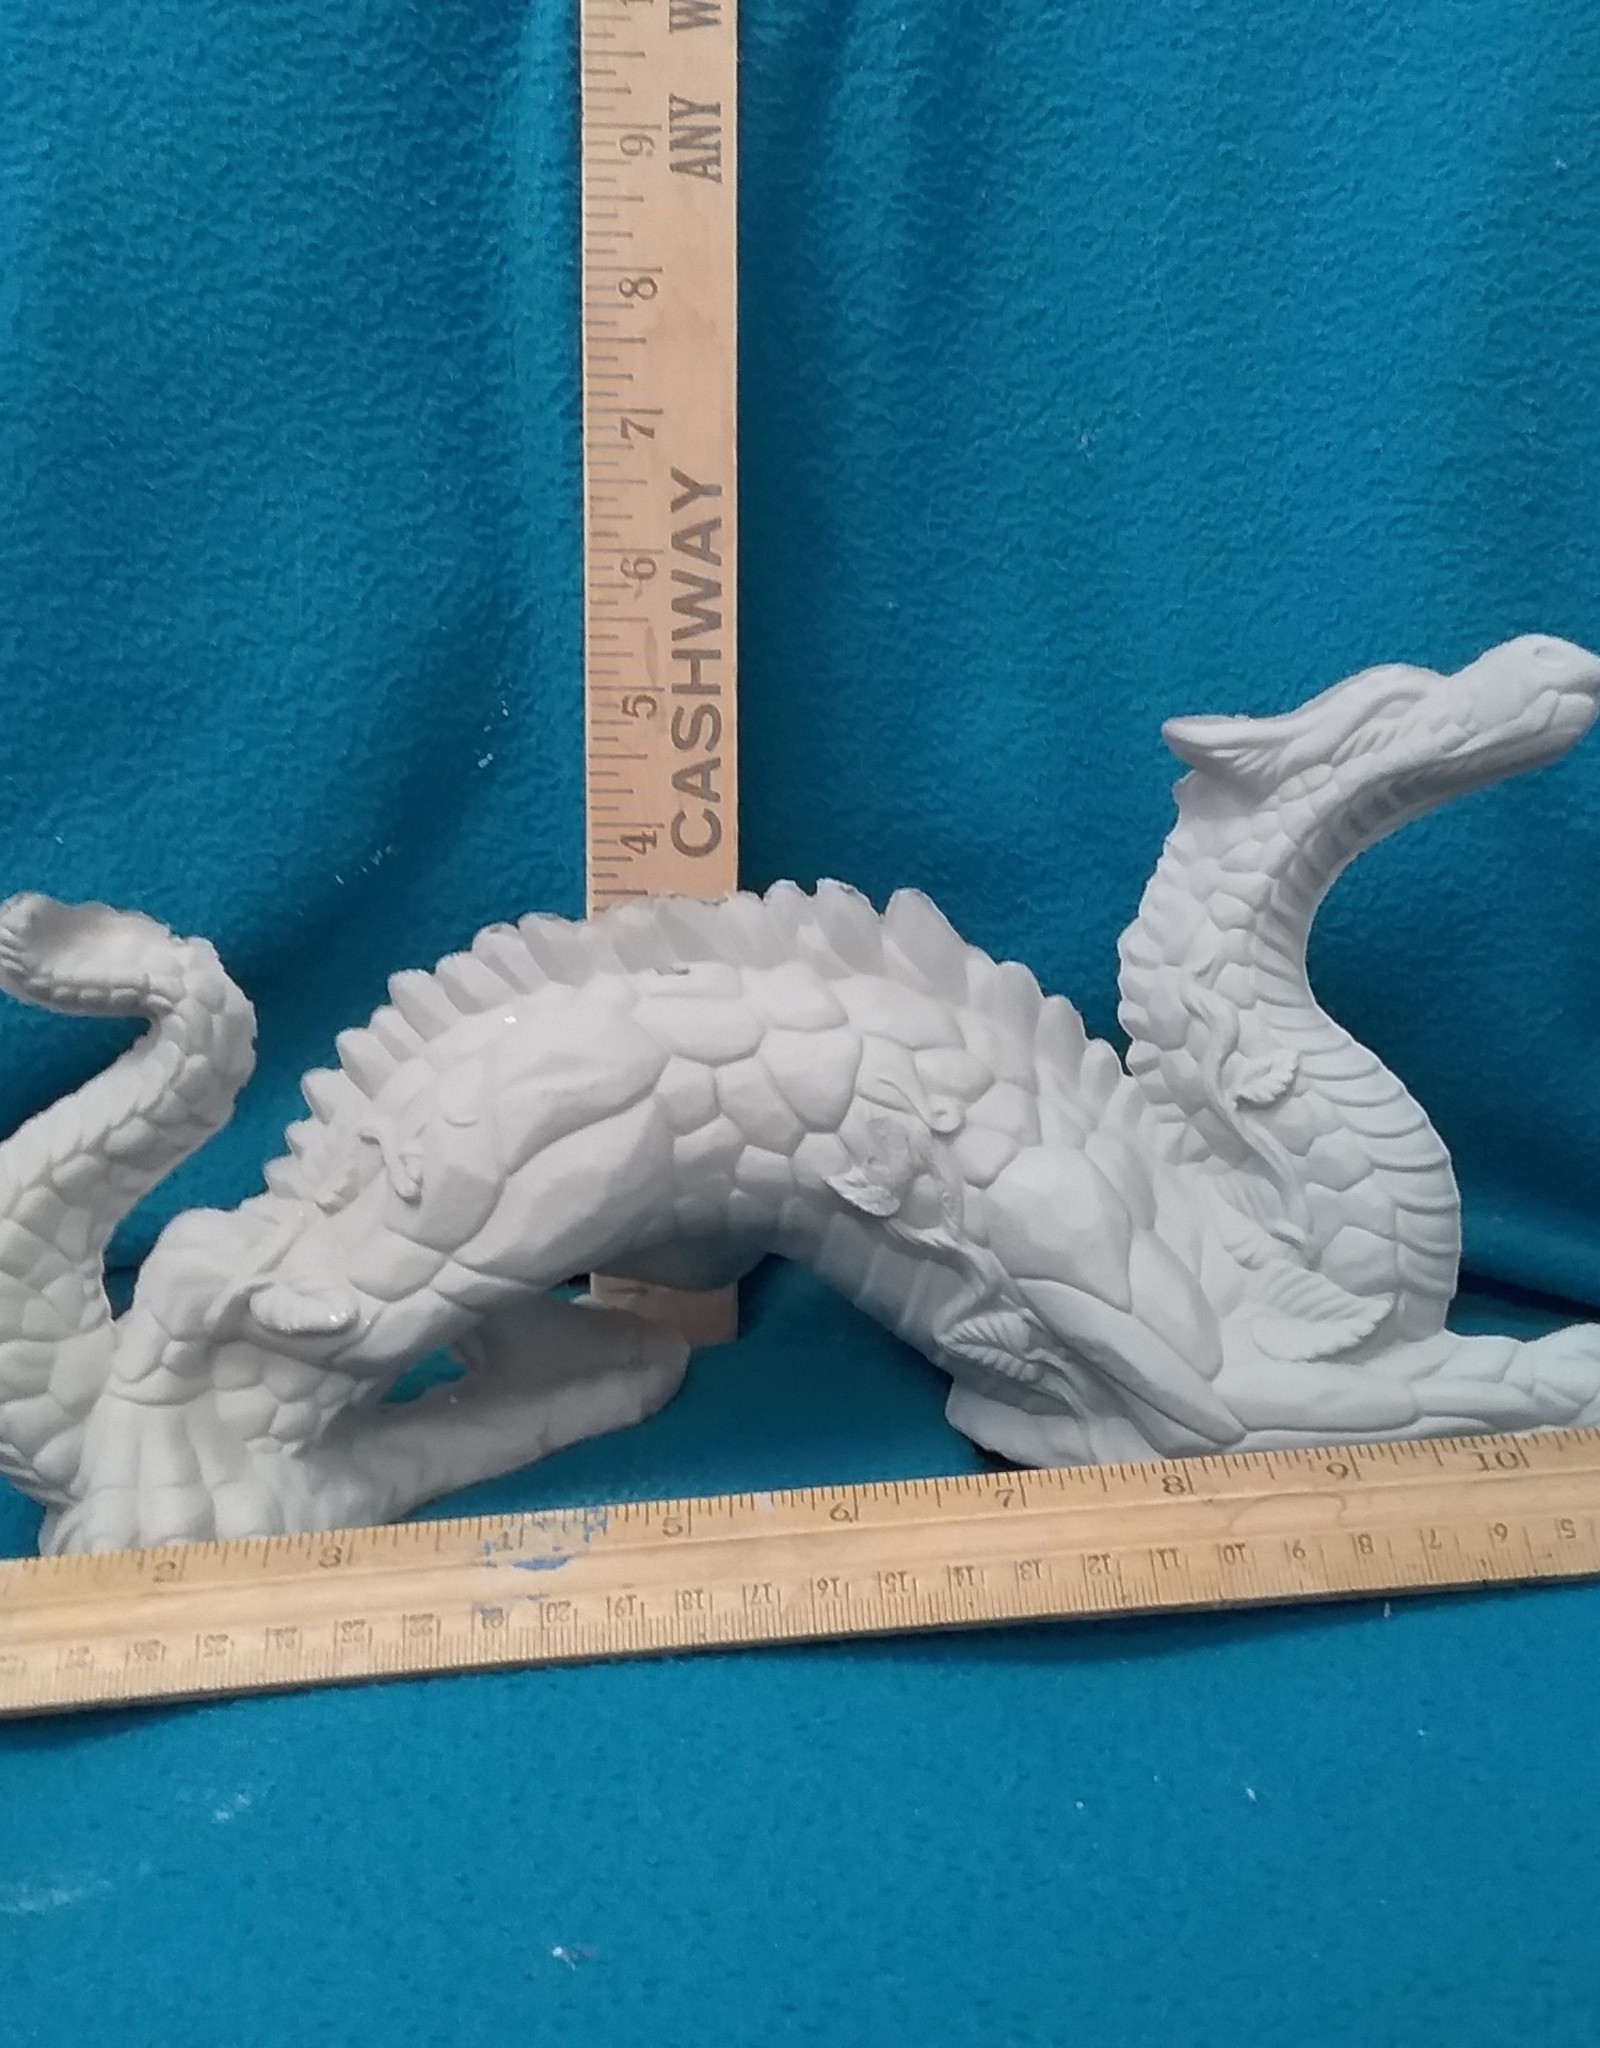 ART KIT Art Kit: Ceramic Dragon serptine #2